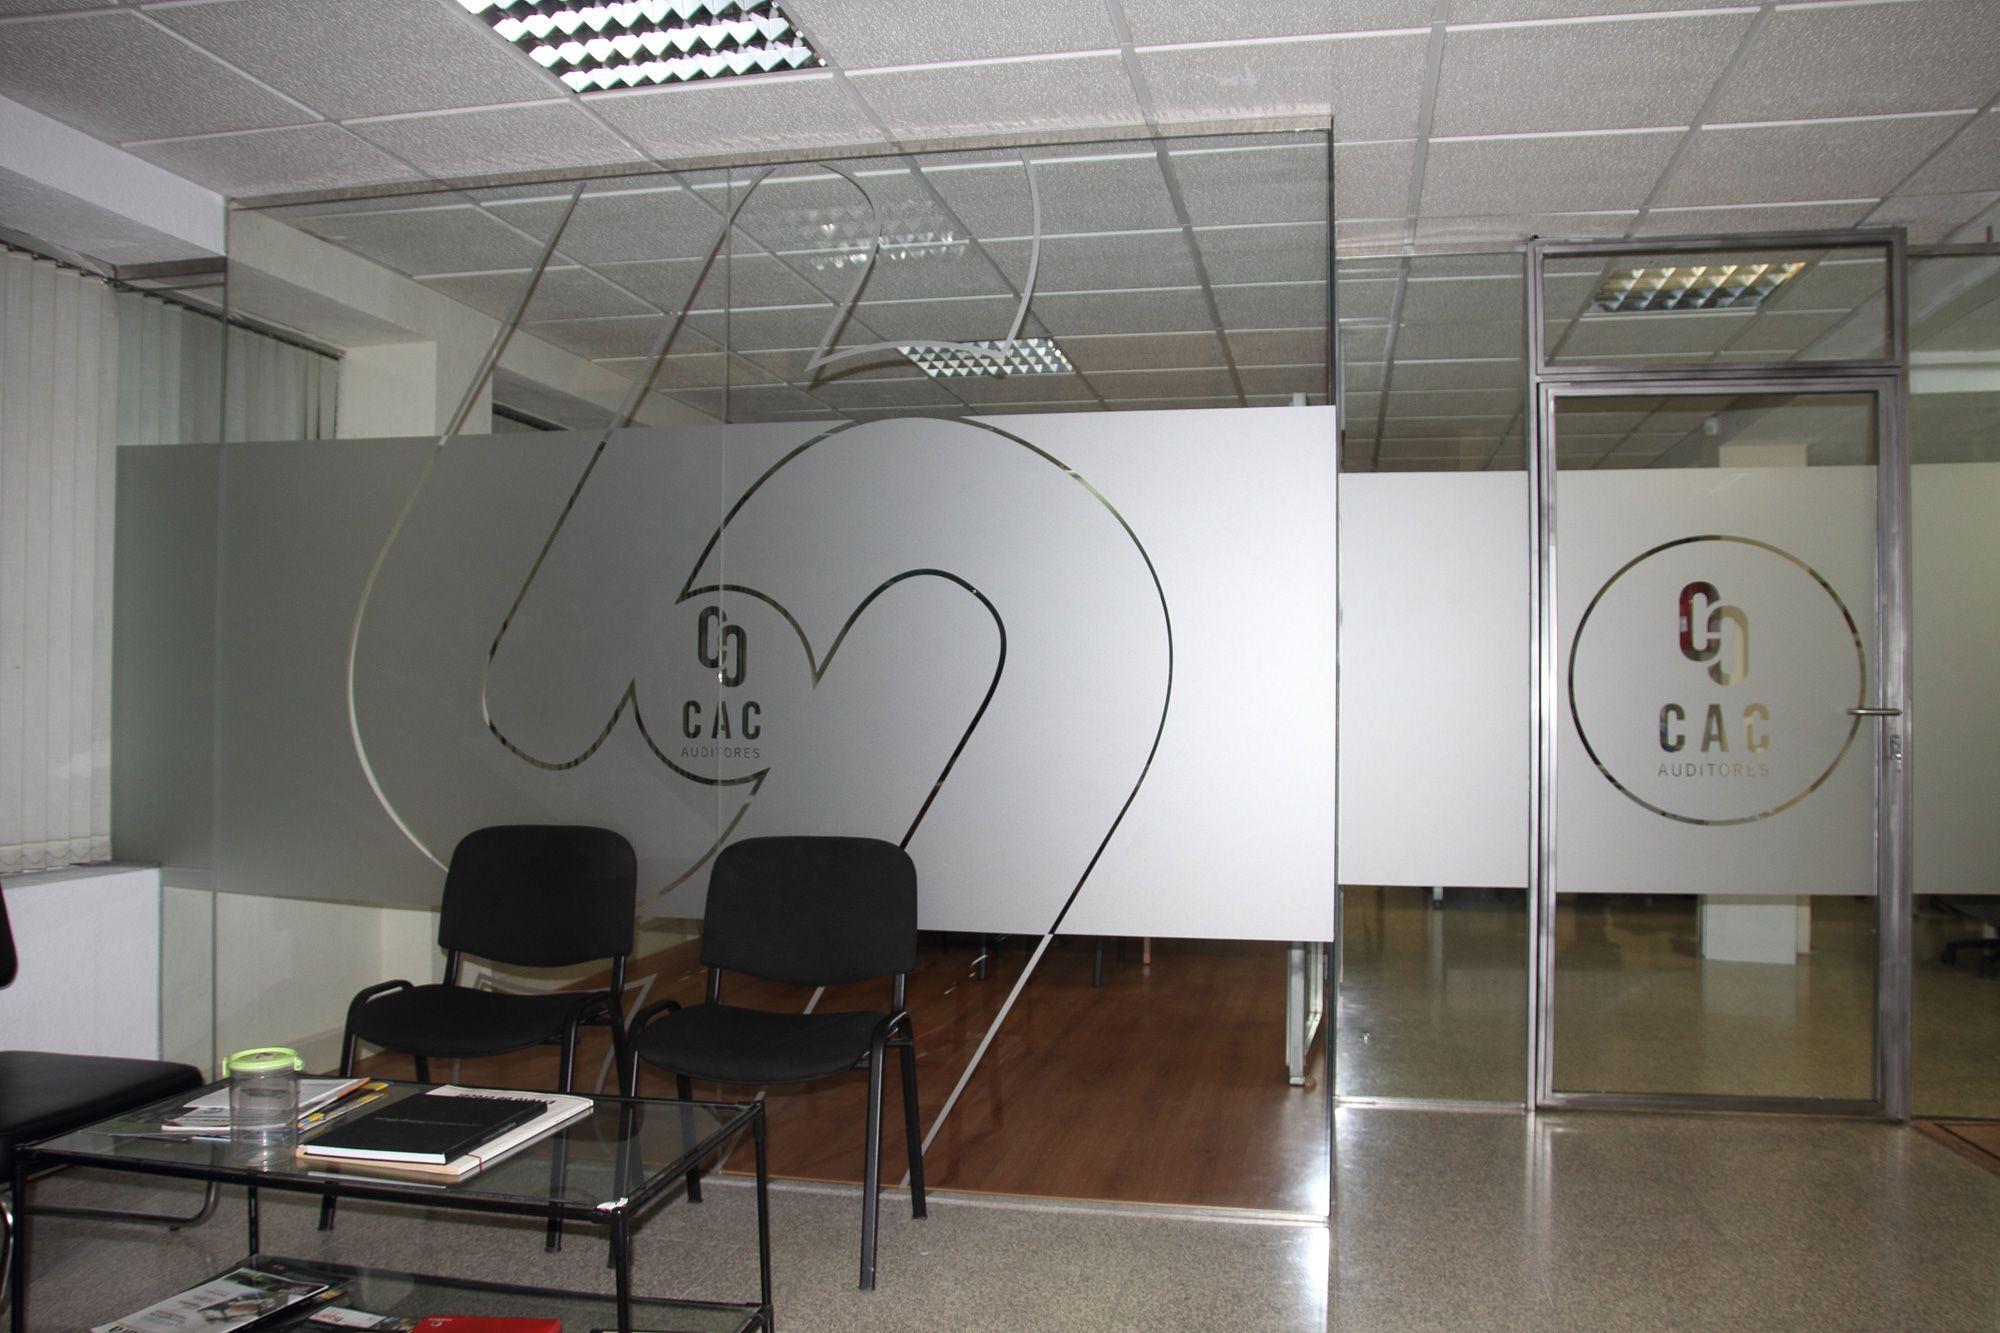 Dise o e instalaci n de vinilos para las oficinas de cac for Vinilos decorativos para oficinas